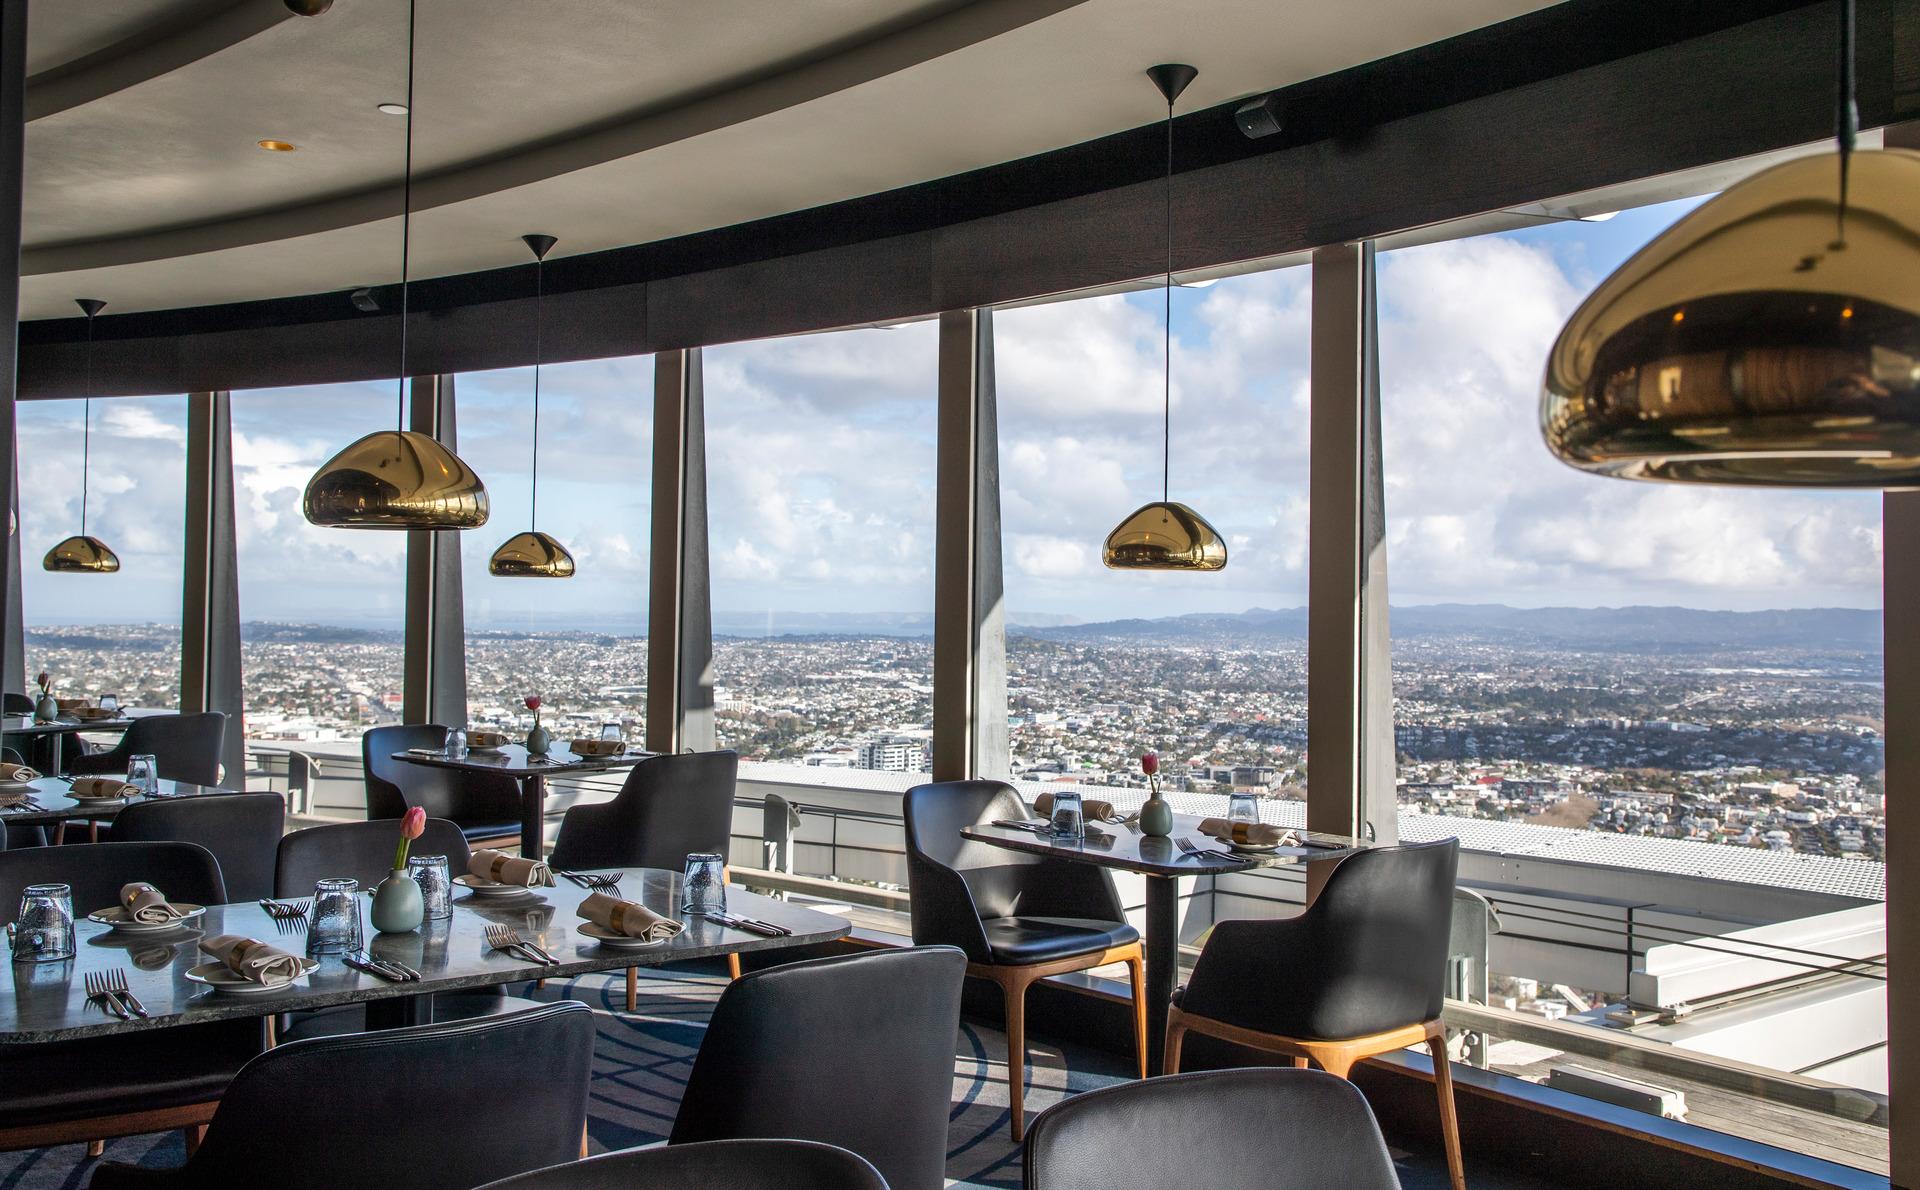 Restaurant owner Leo Molloy slams SkyCity in social media post